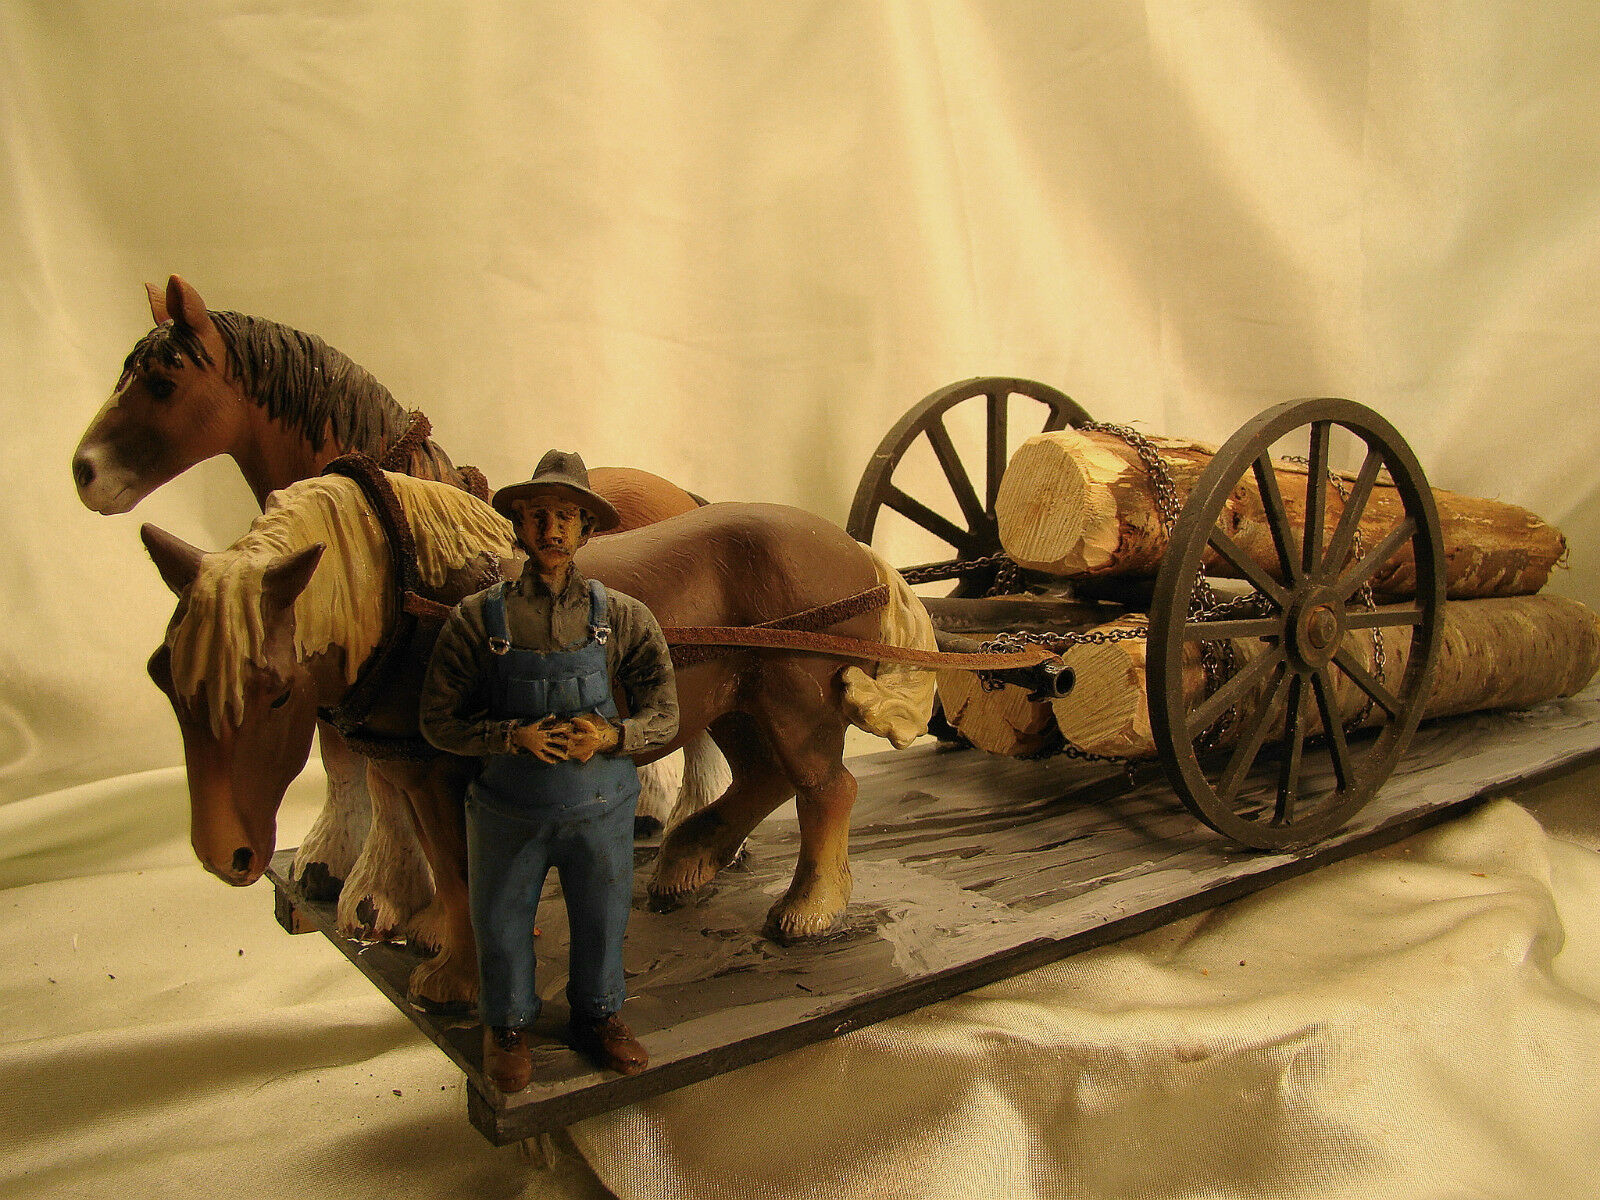 Big hjul Horse Logging Diorama, skräddarsydd, handgjord - pkonsti 4 - G skala